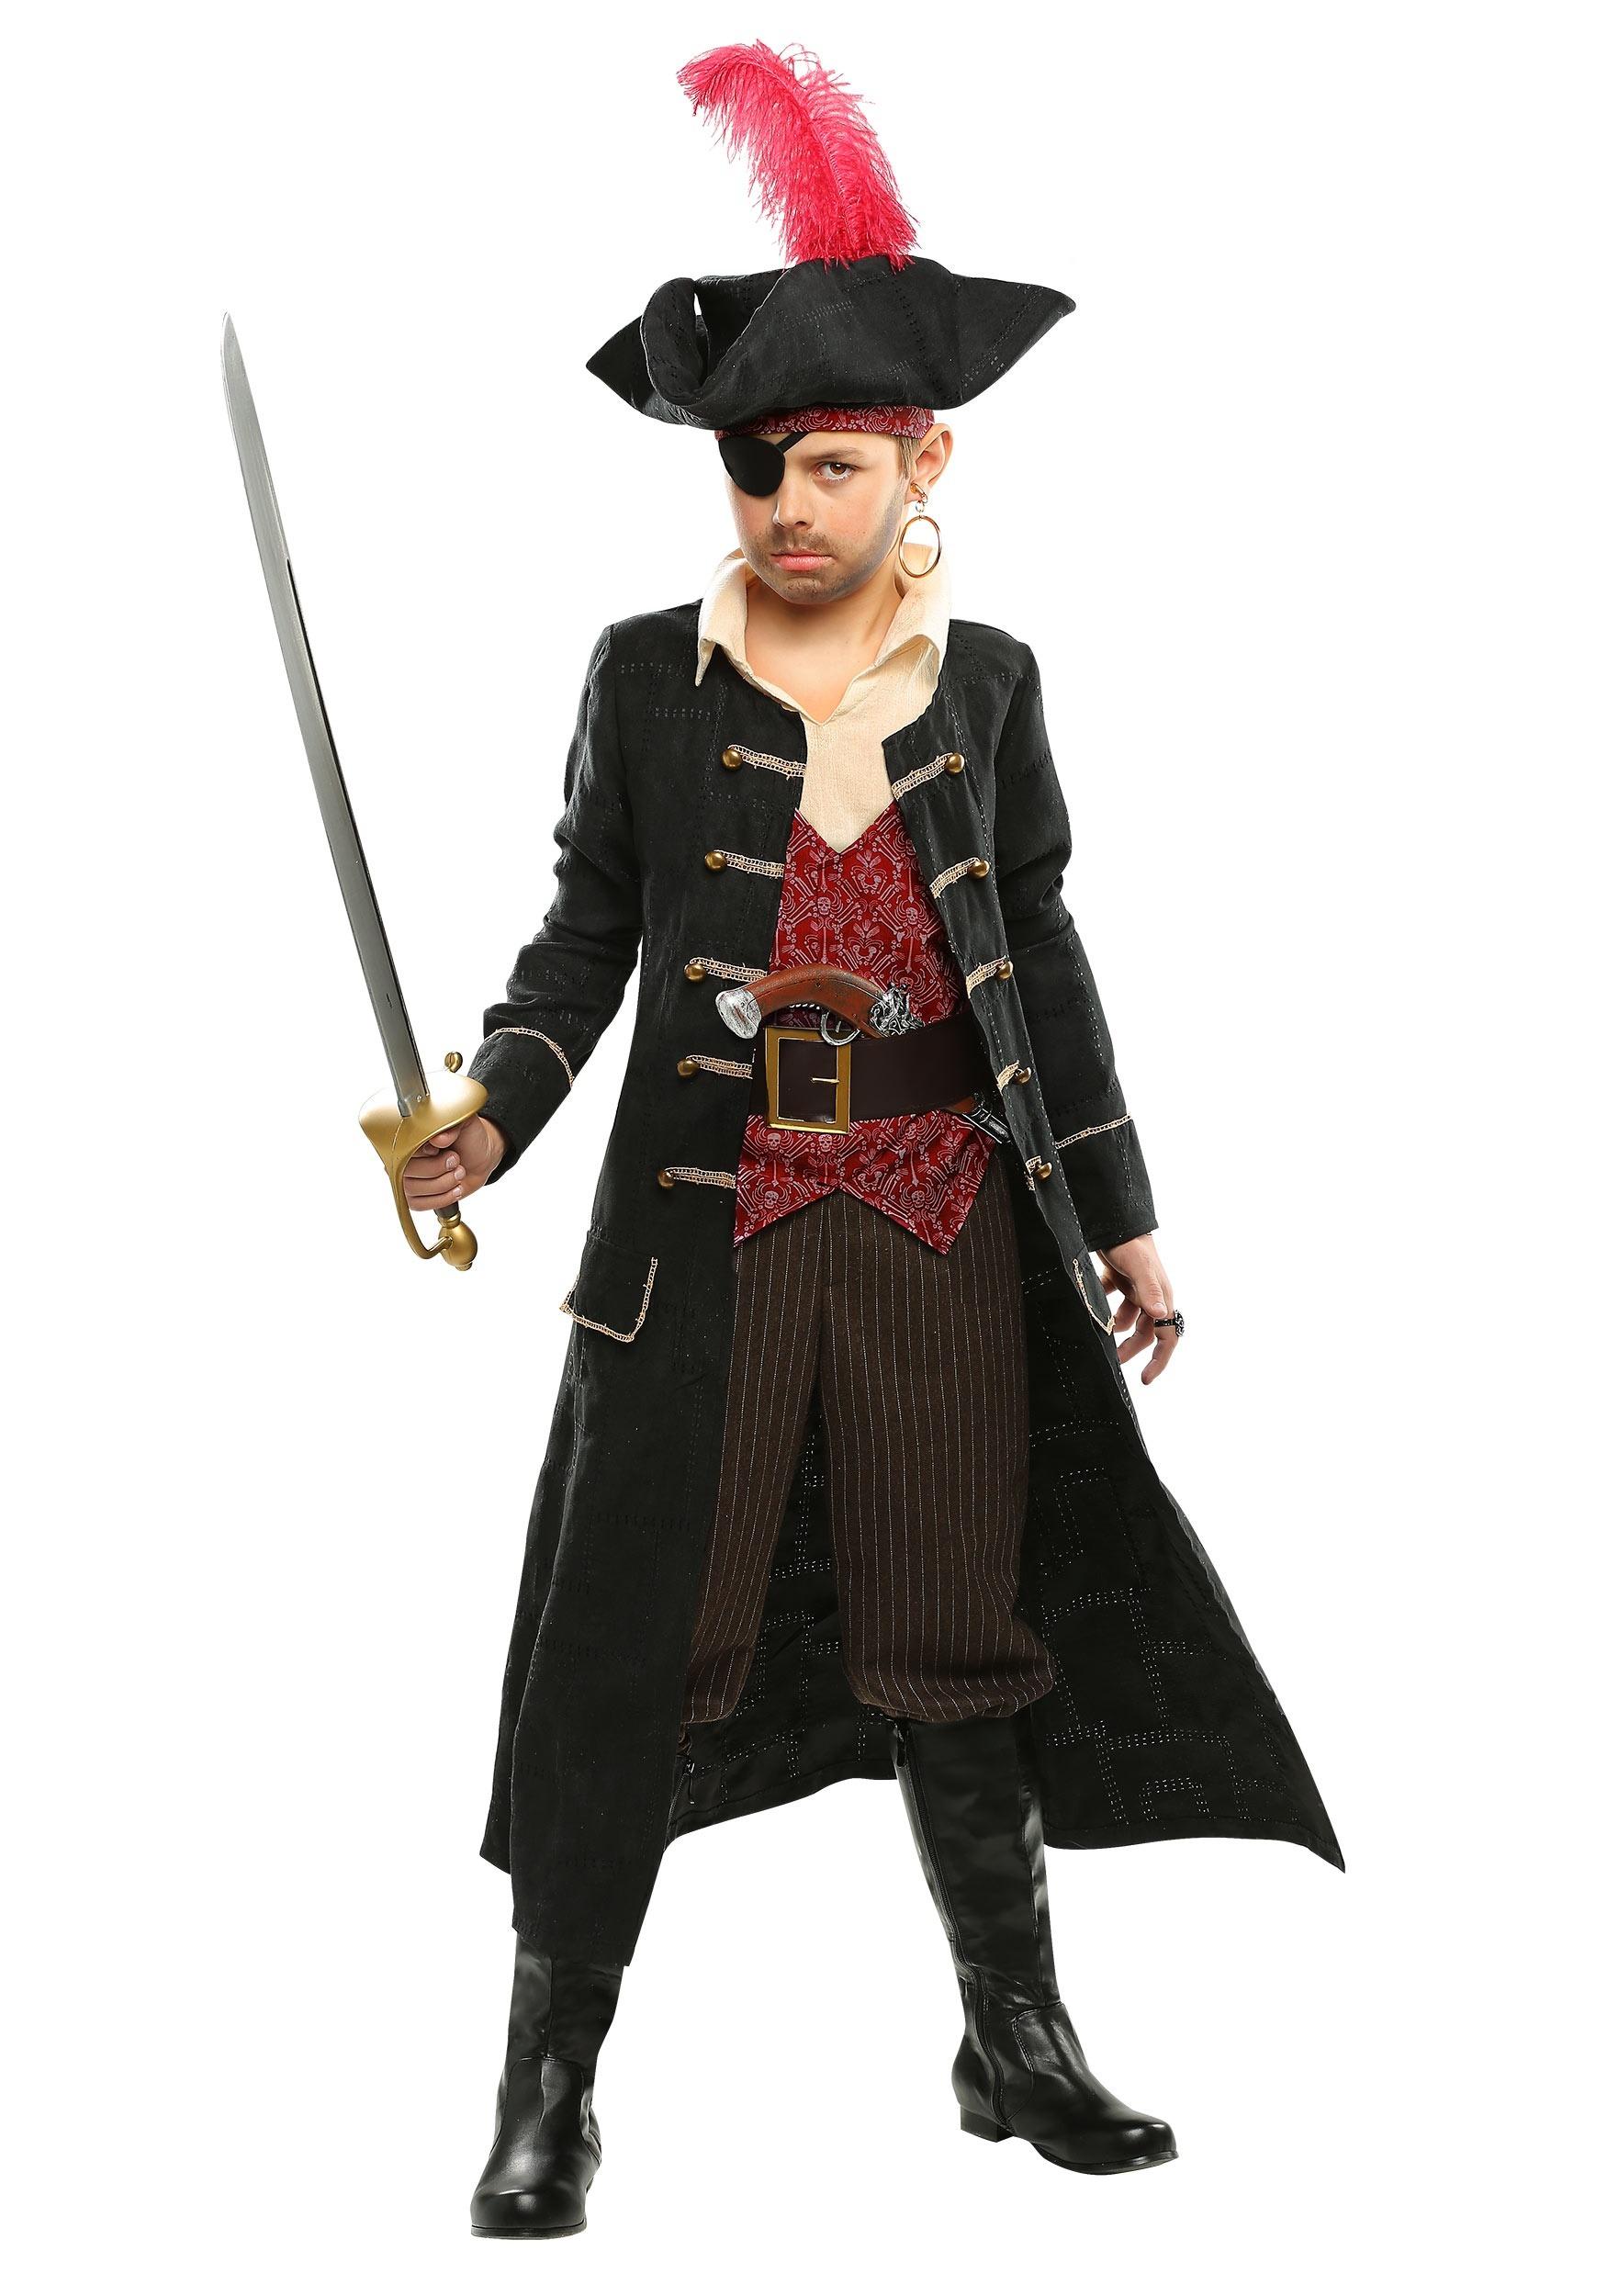 Child Pirate Costumes - Kids Boys, Girls Pirate Halloween Costume